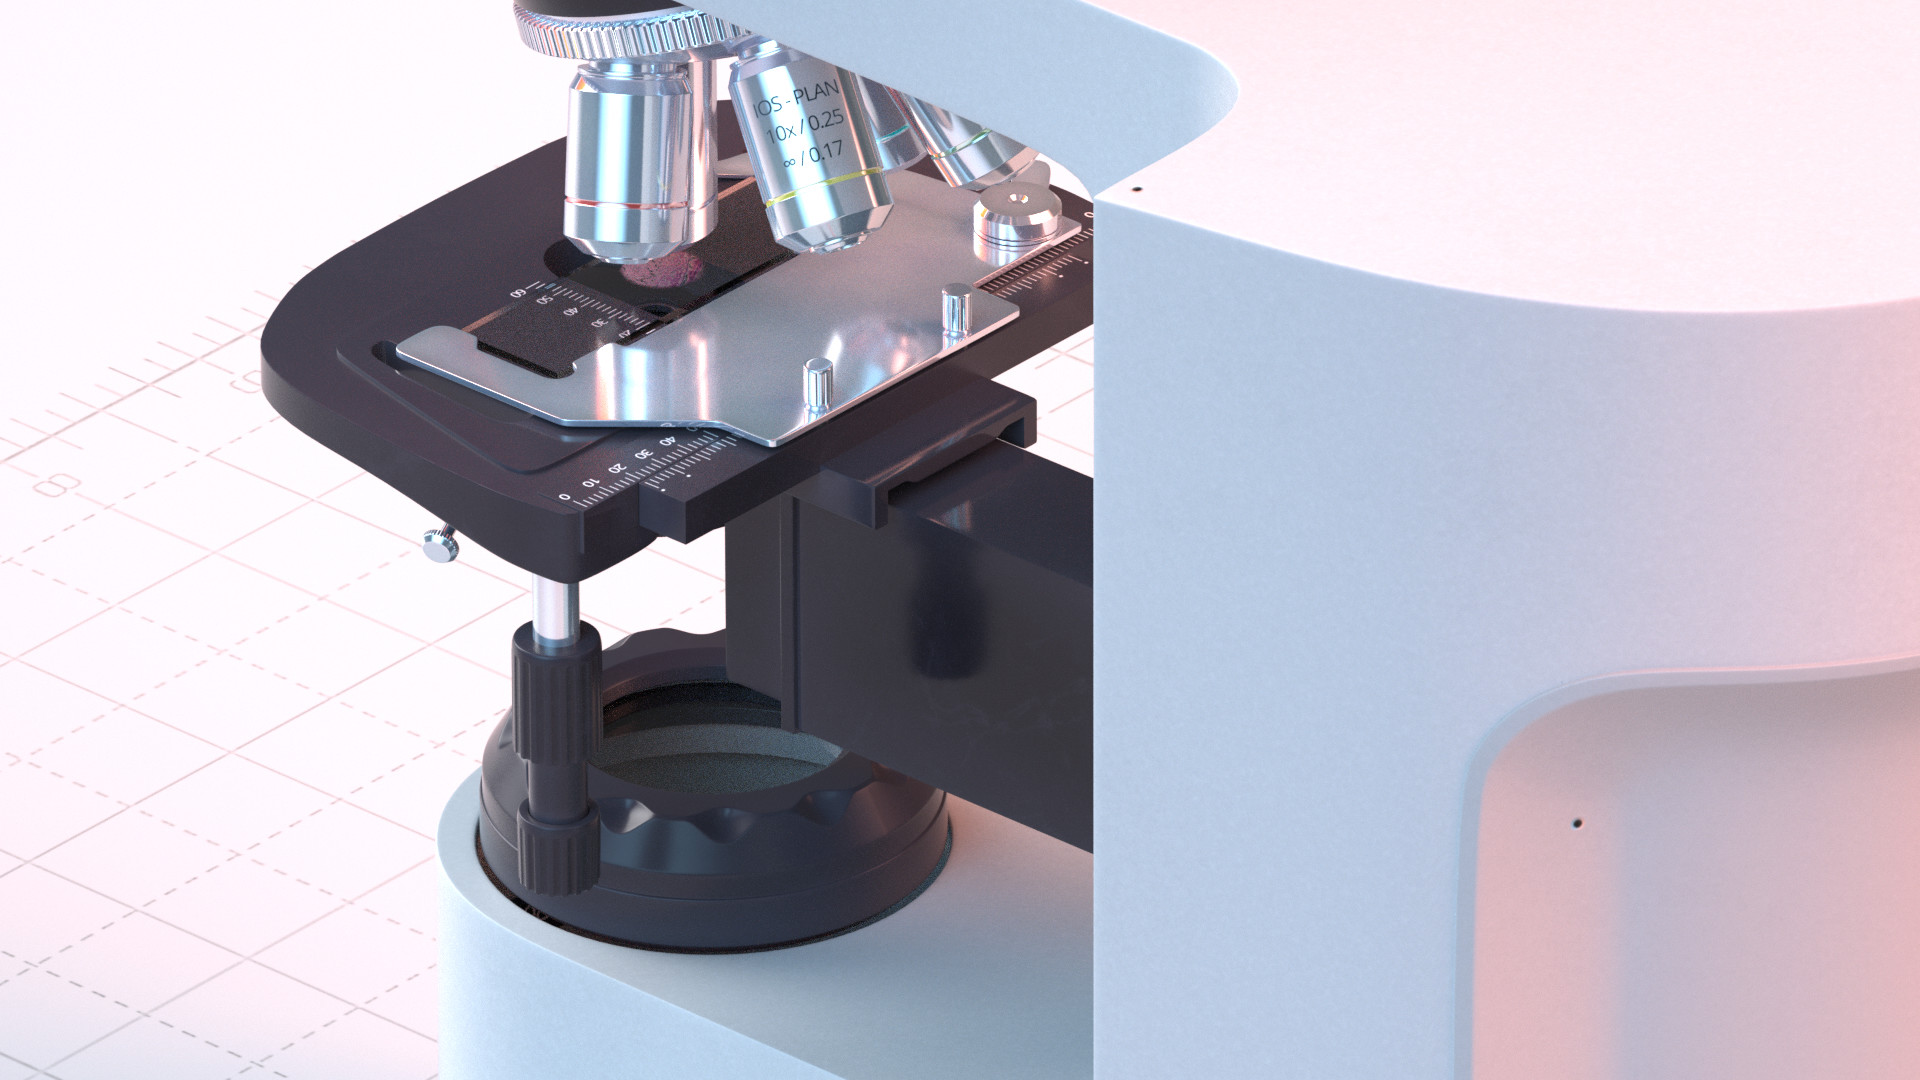 Basile arquis magicbulb upright microscope 04